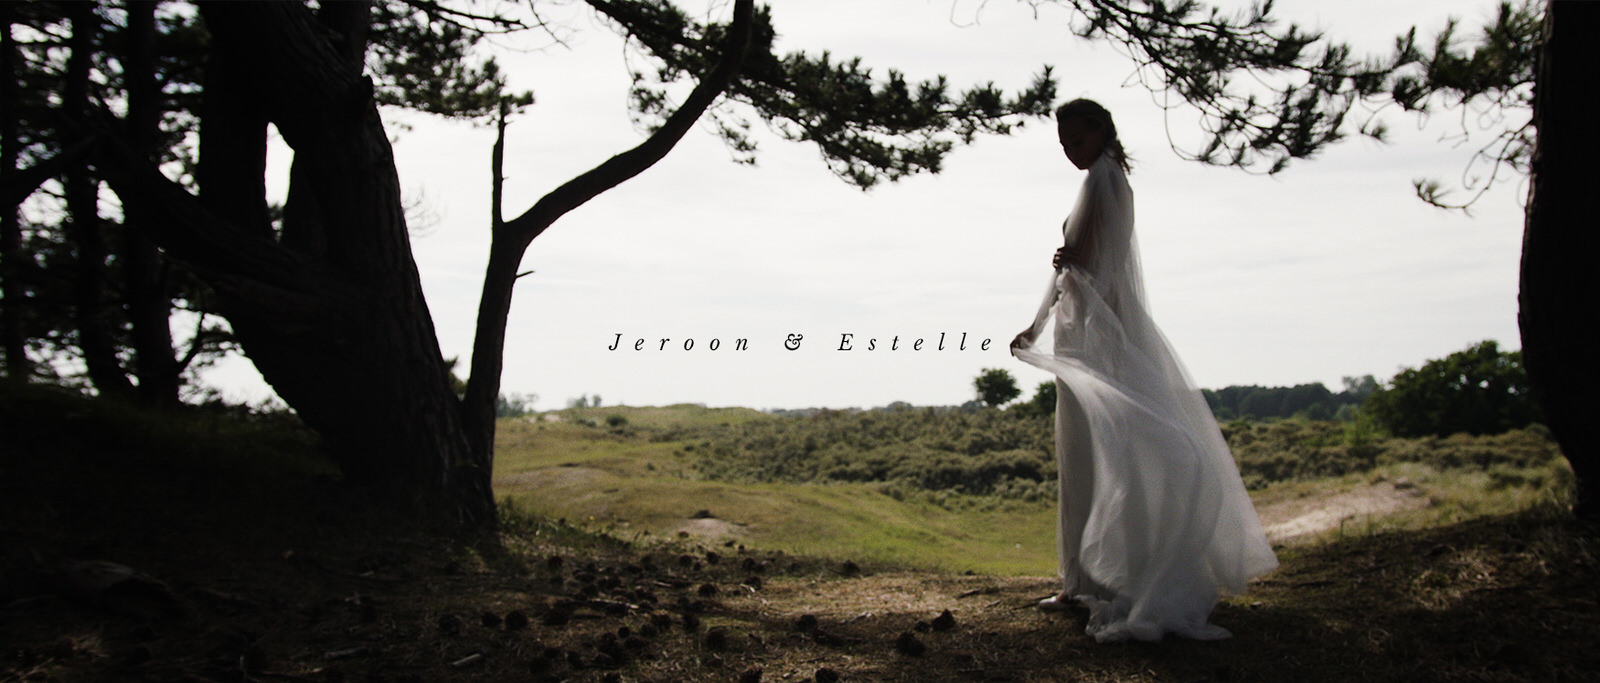 jeroon-estelle-trouwfilm-trouwvideo-videograaf-dreamers-amsterdam-rotterdam-hulstkampgebouw-drone-4k-web